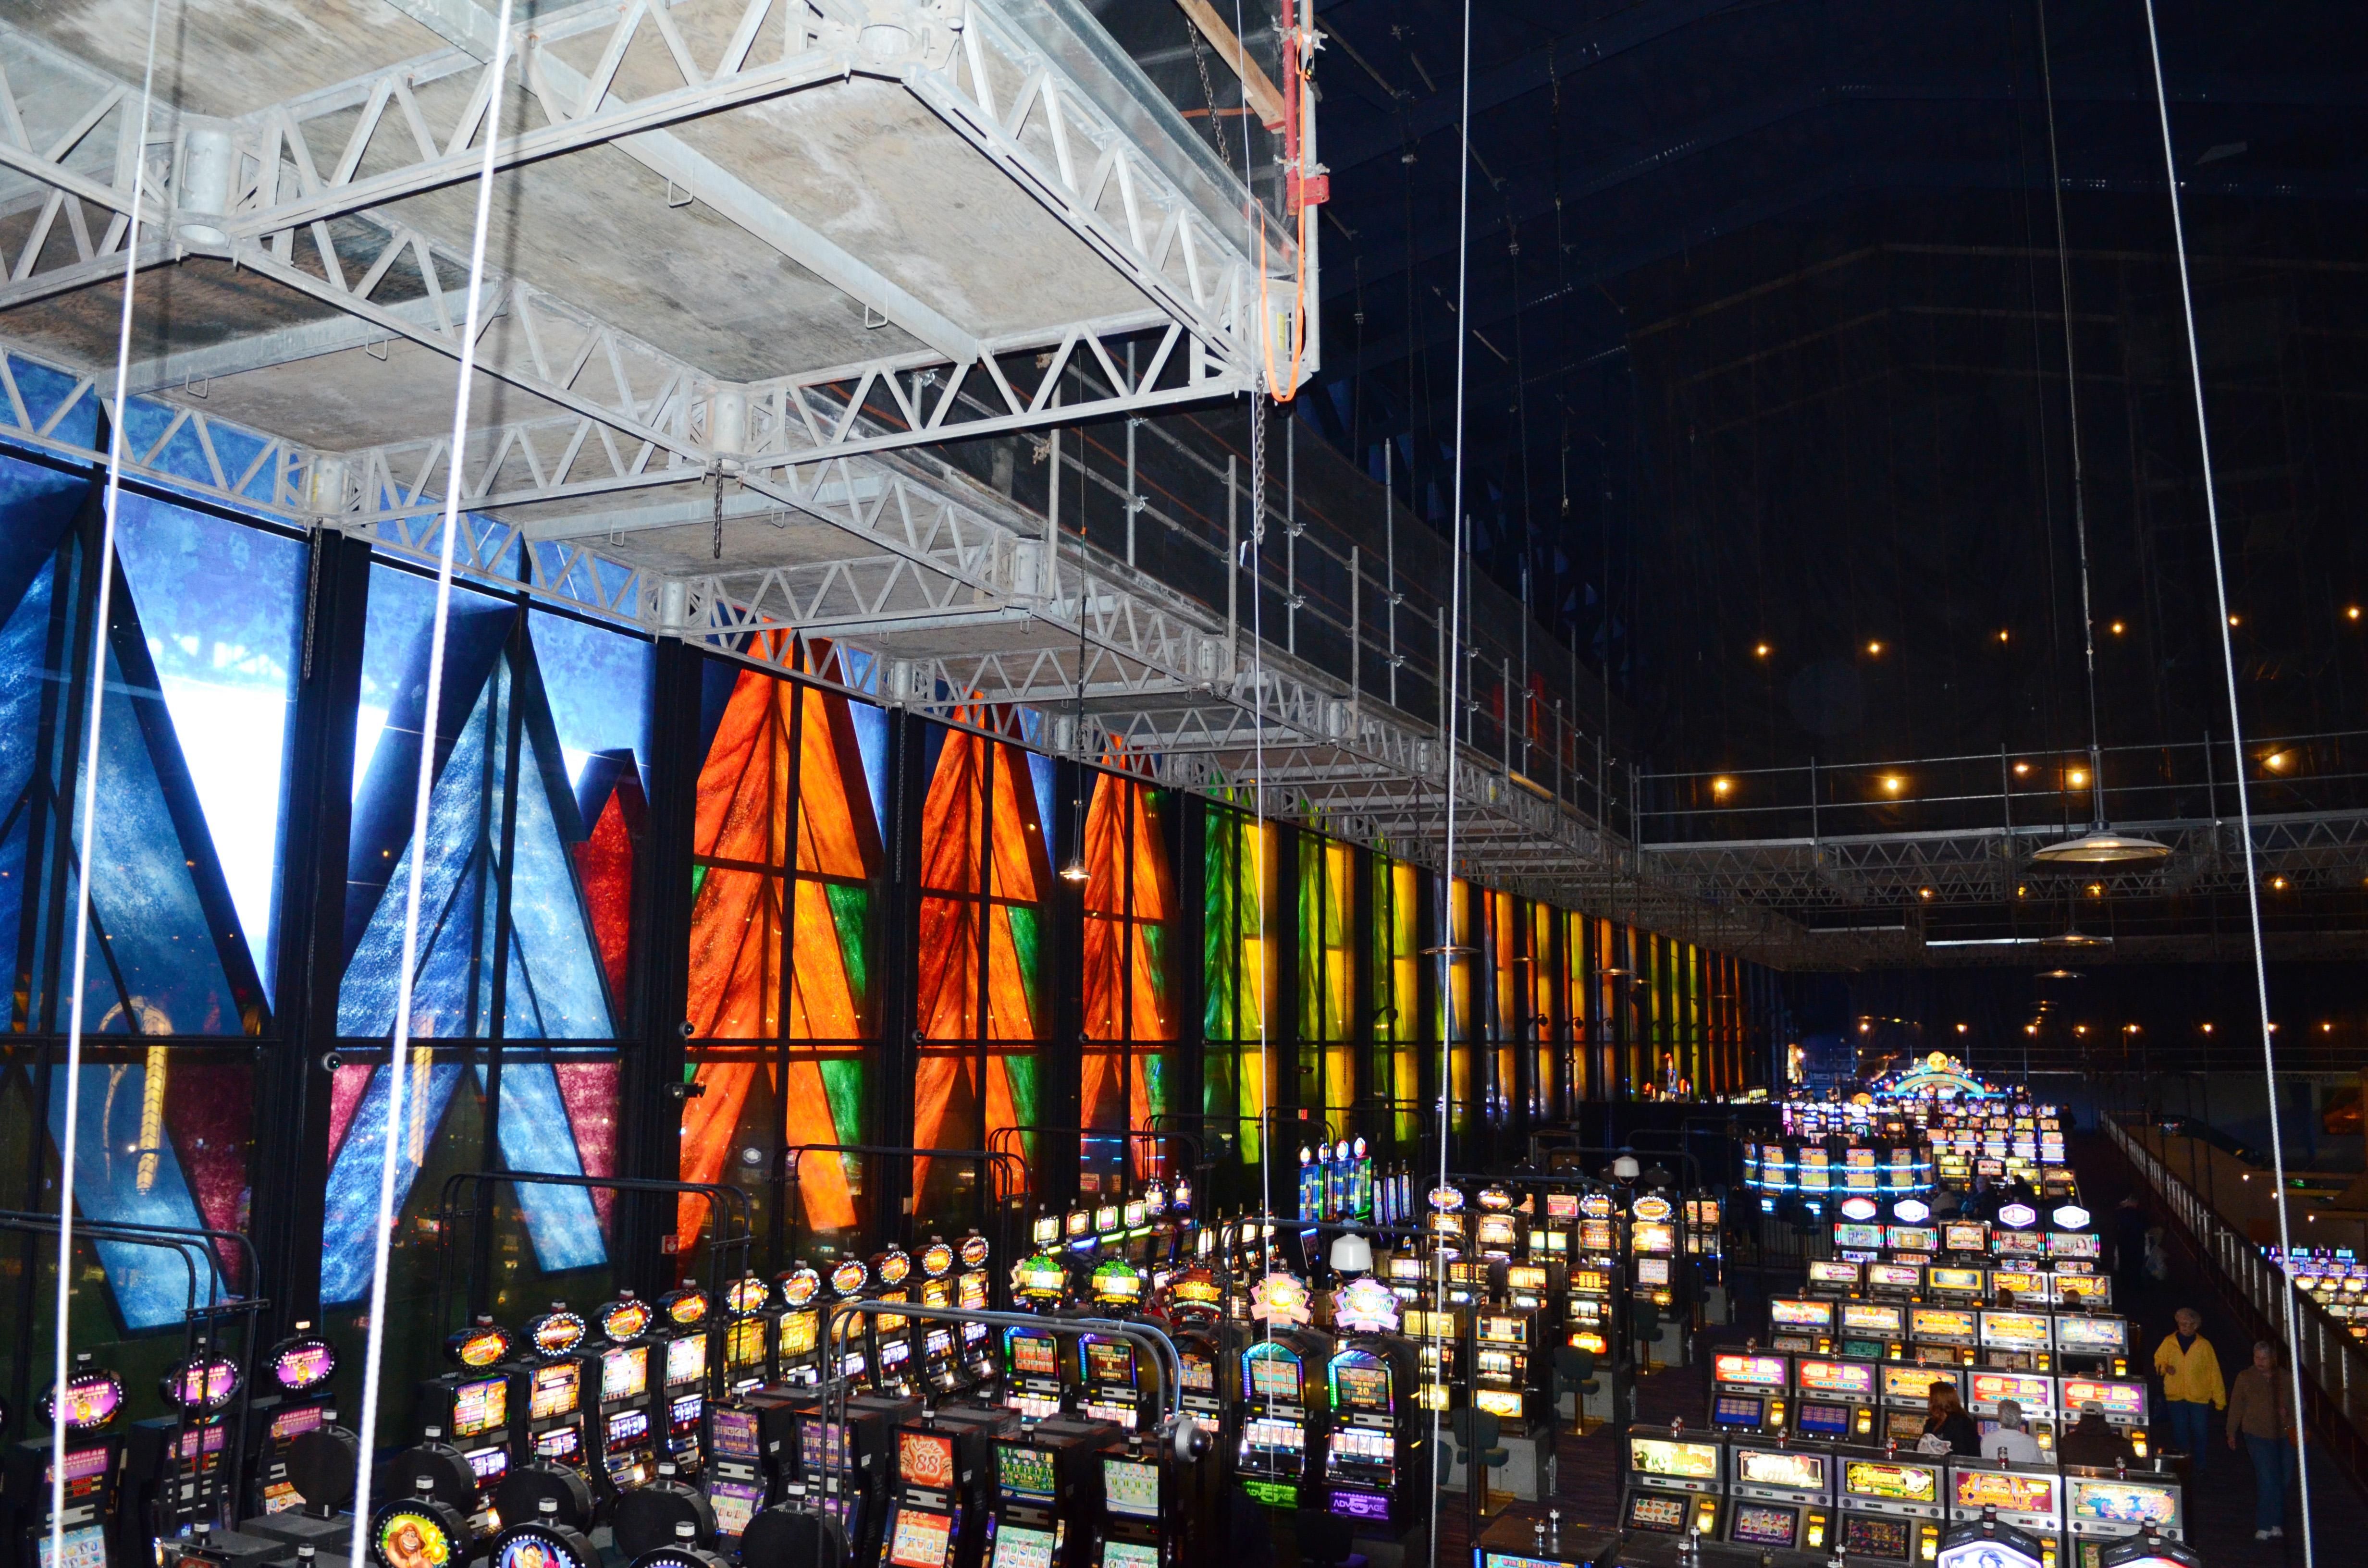 Seneca Niagara Casino, Niagara Falls, NY, Superior Scaffold, scaffolding, multipoint suspended scaffold, equipment, rentals, 215 743-2200